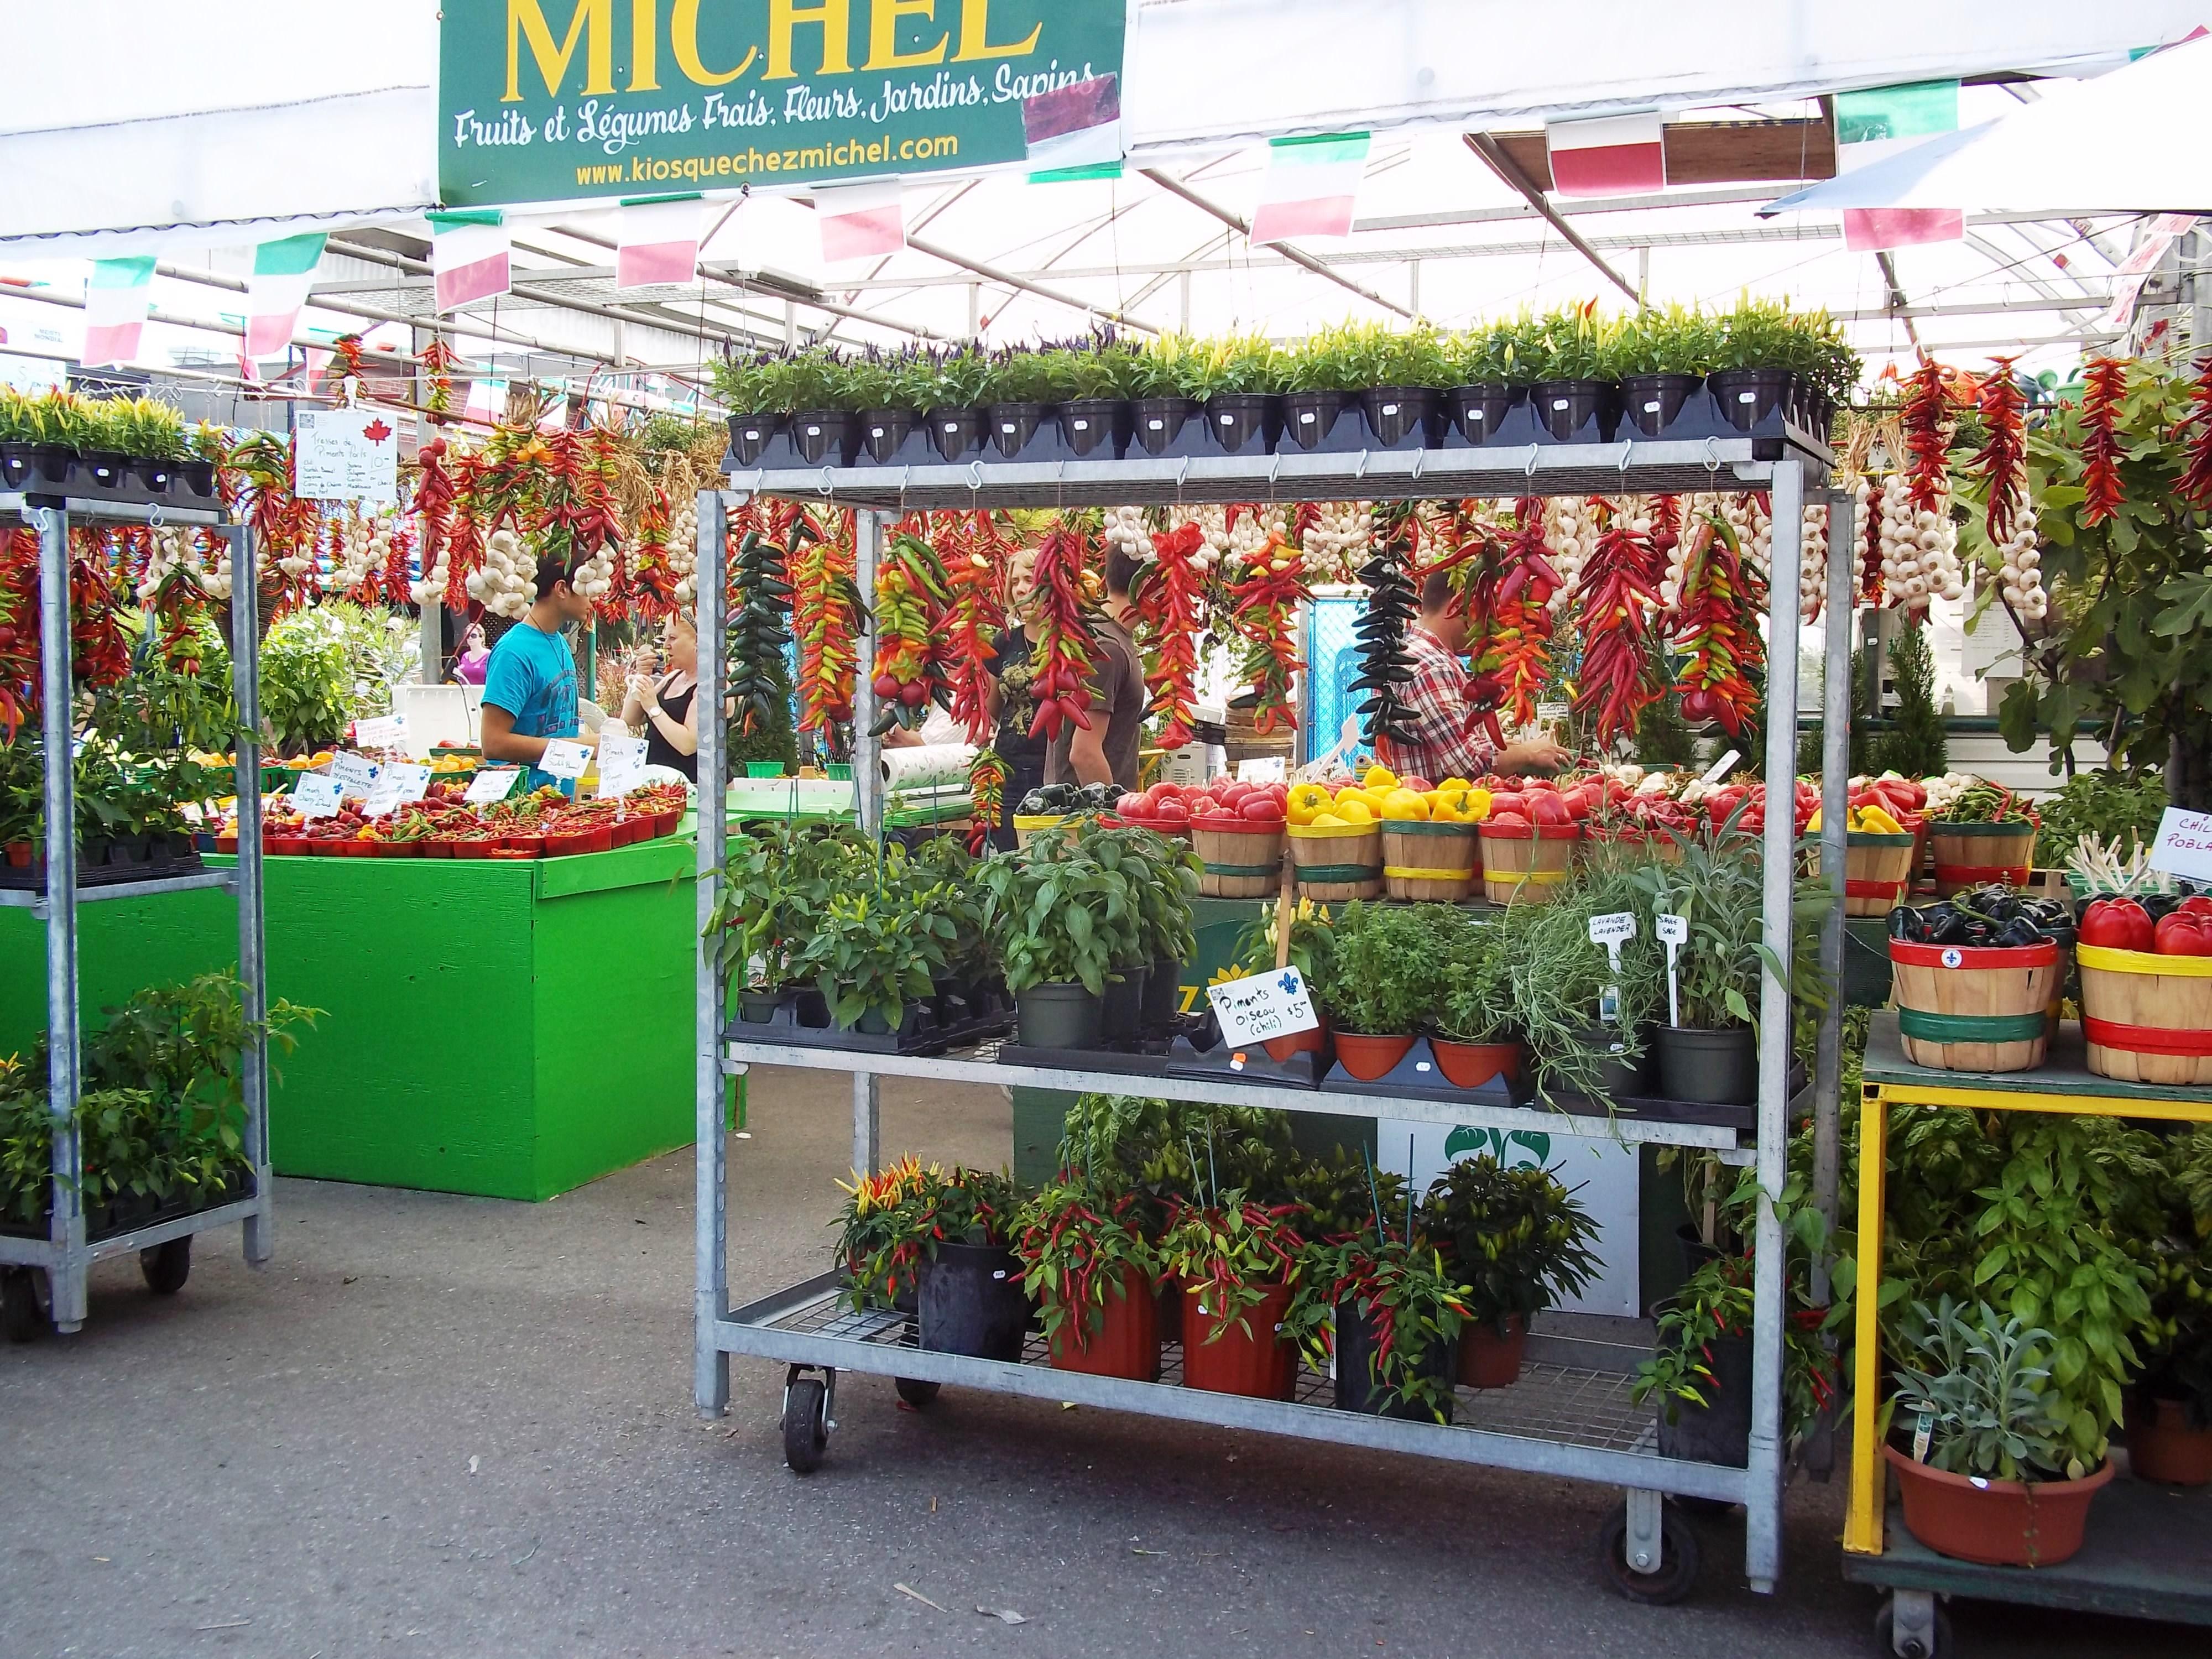 Balcony Kitchen Garden Balcony Garden My Lighthearted Kitchen